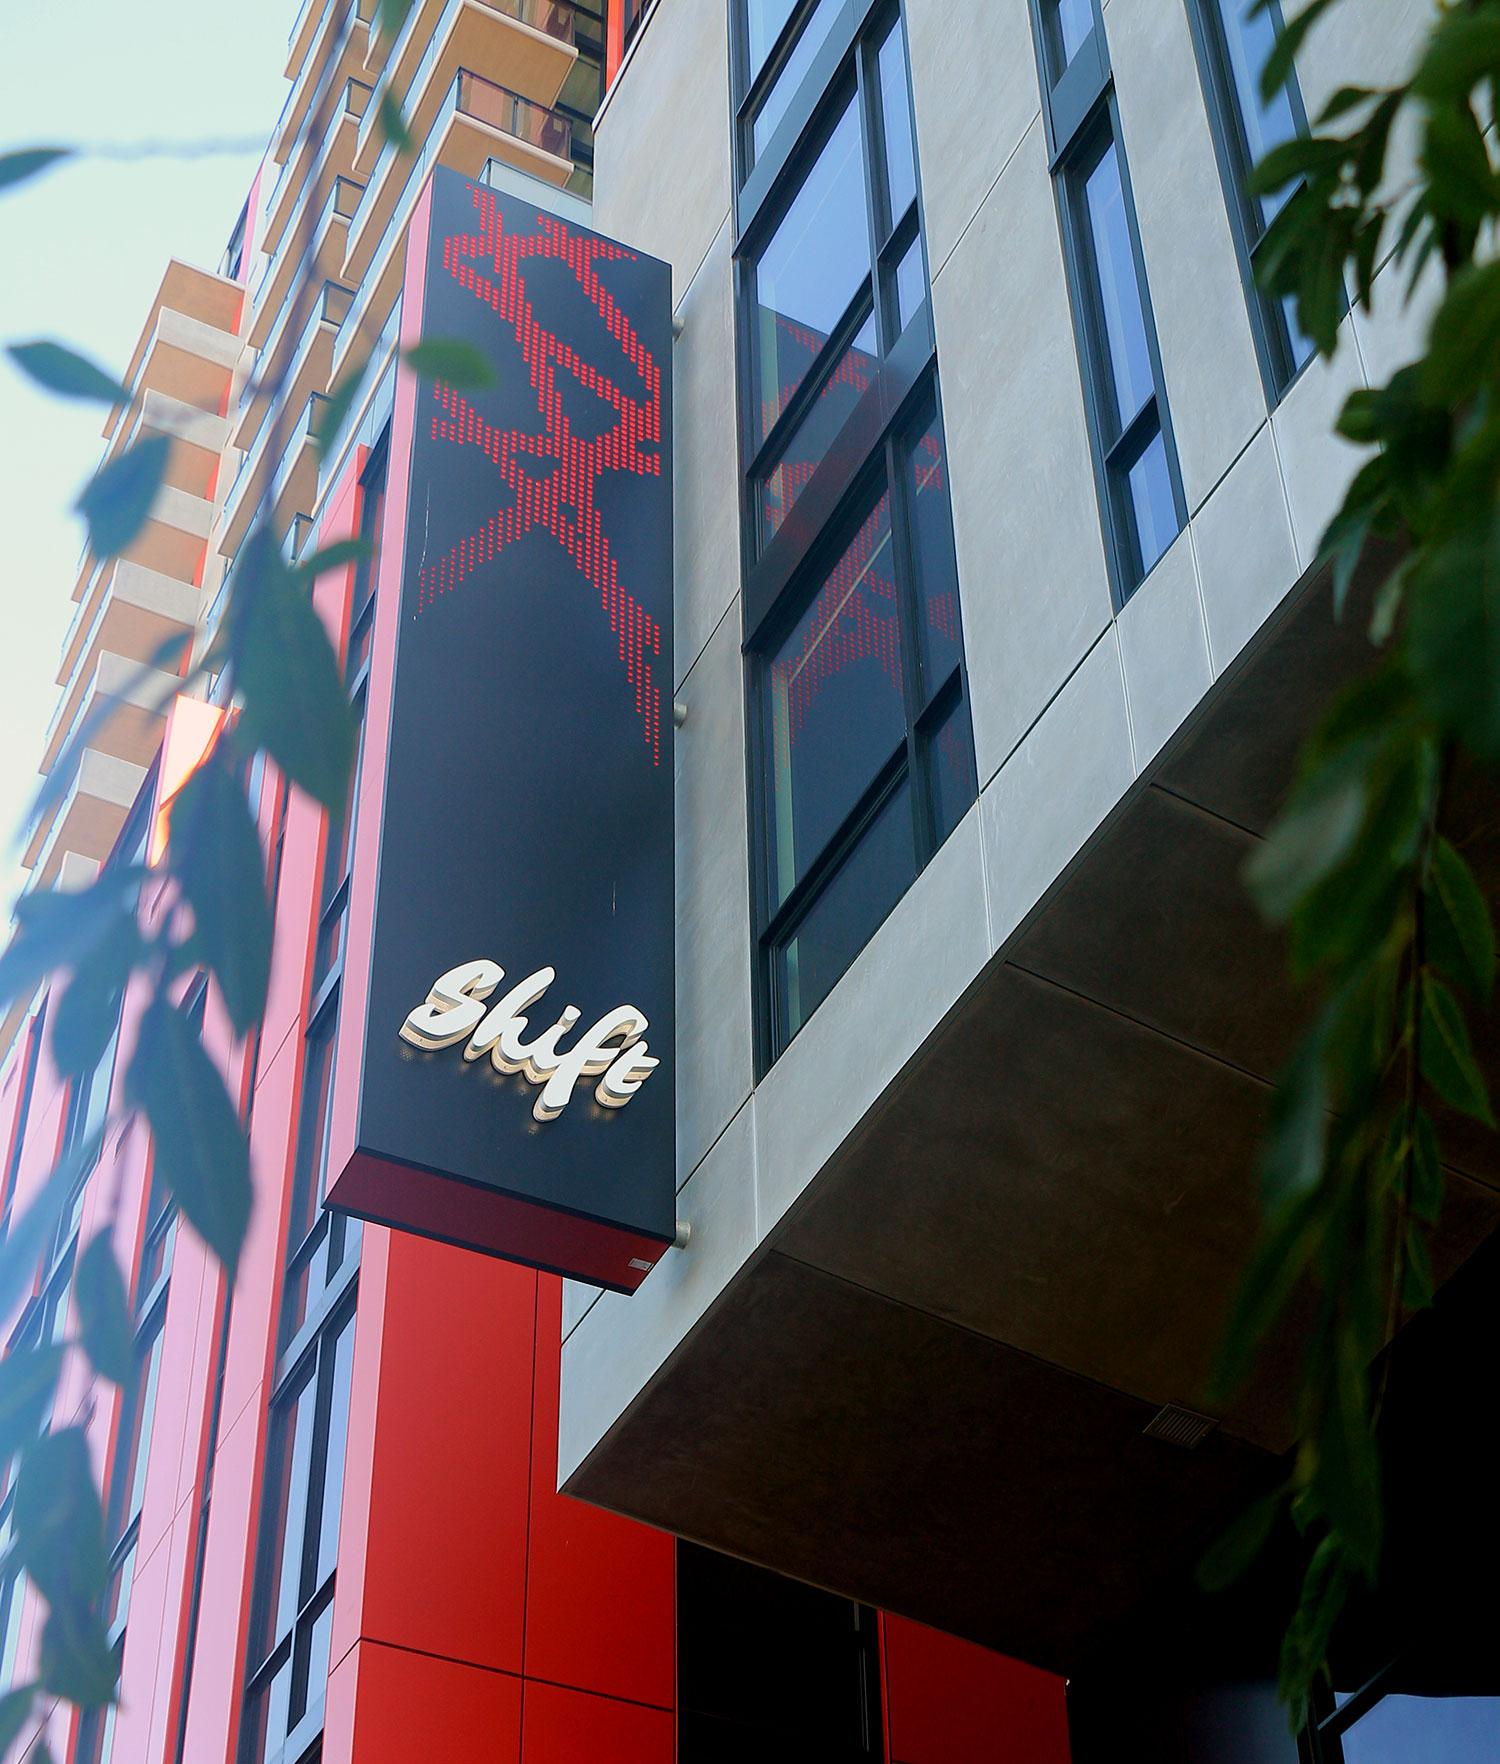 miriello-grafico_SHIFT-San-Diego-East-Village-Downtown-apartment-branding-25.jpg